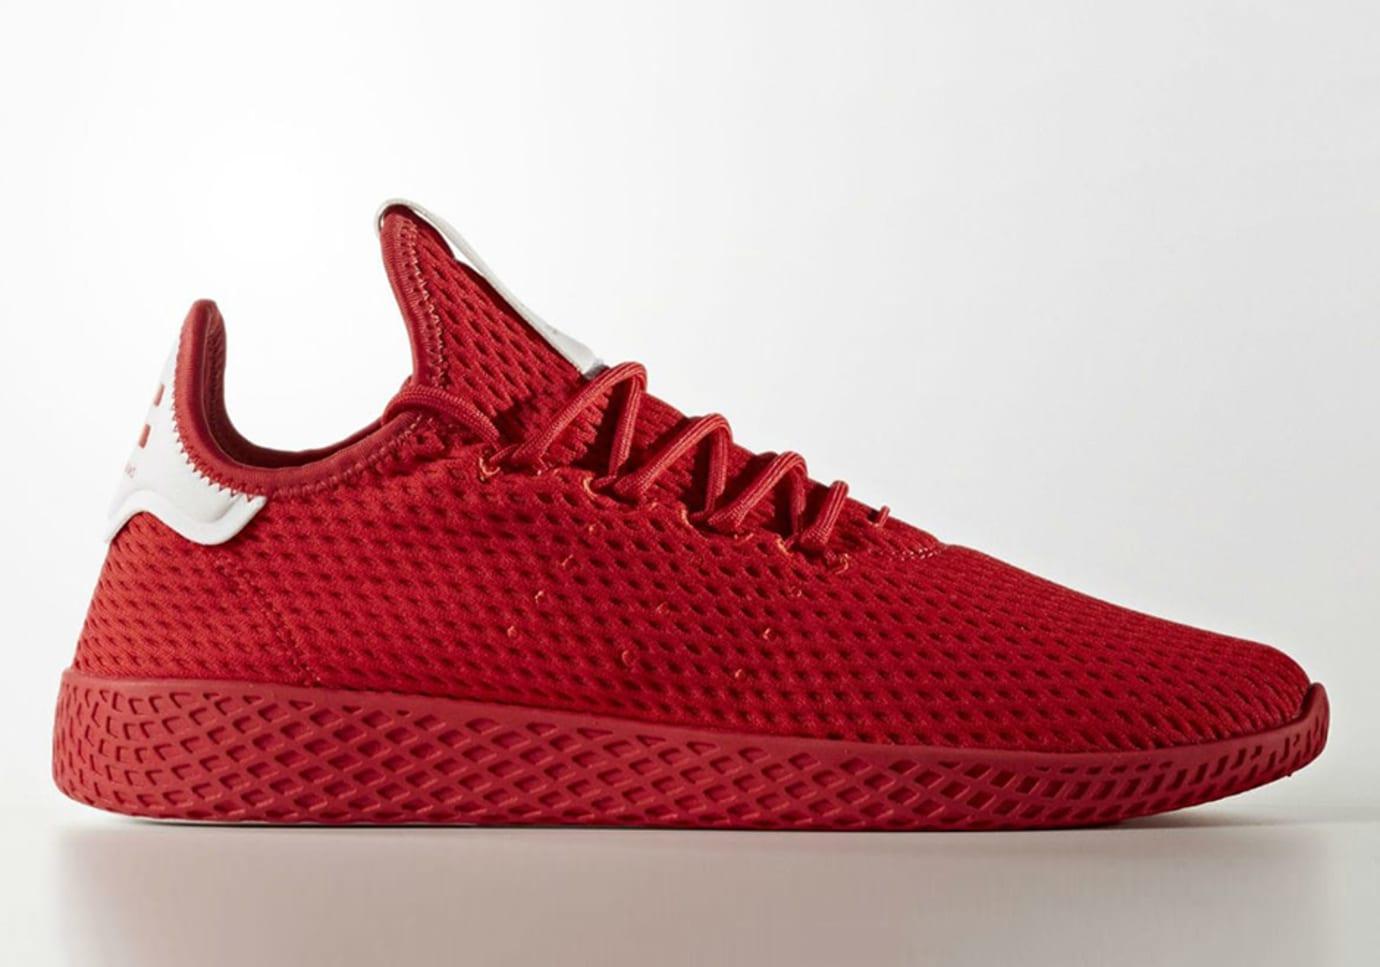 Pharrell Williams x Adidas Hu Tennis Red